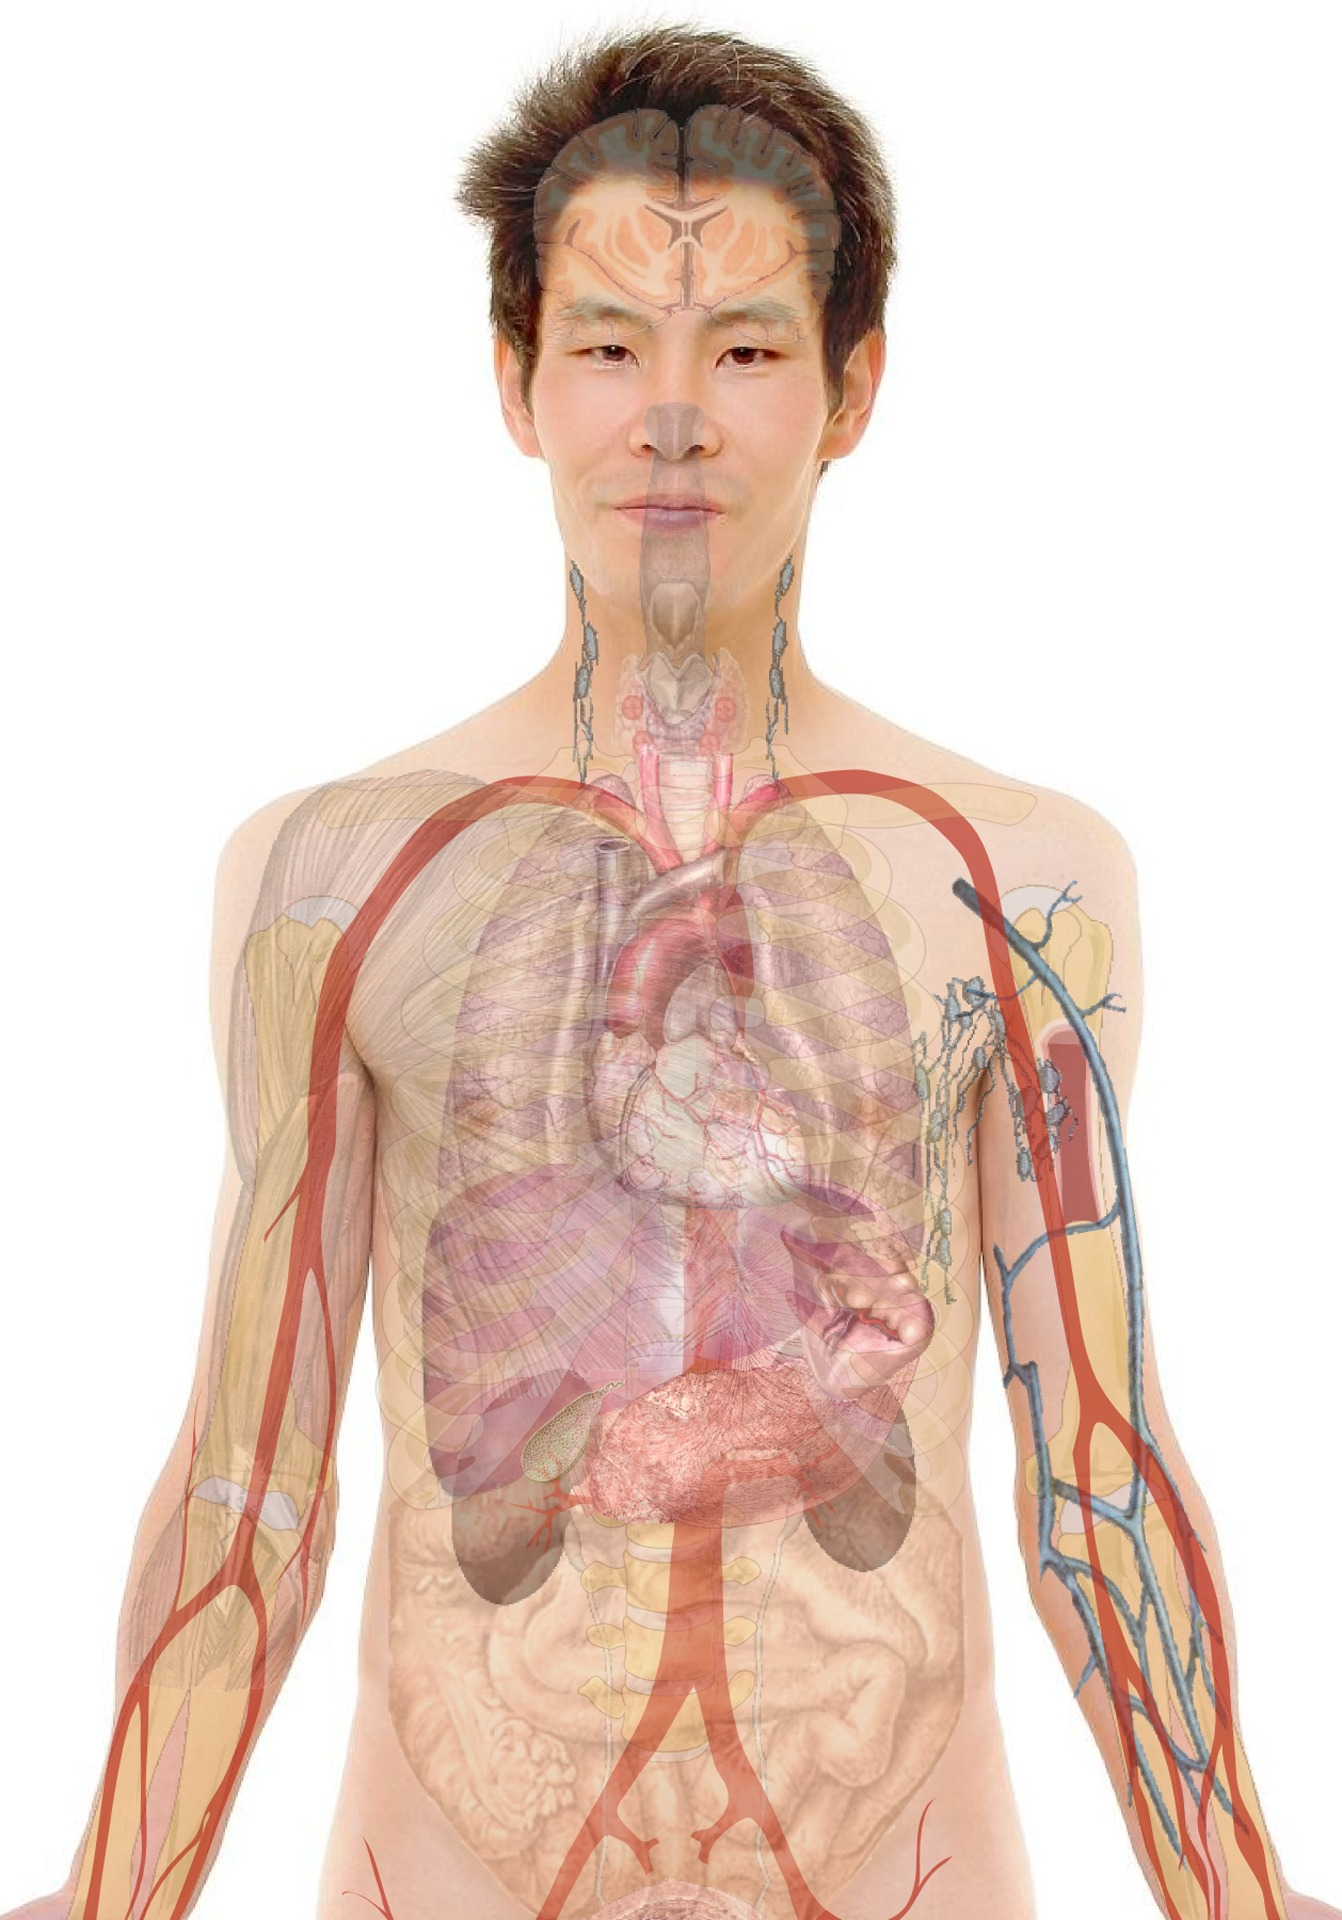 paraziták és crijevima covjeka tünetek